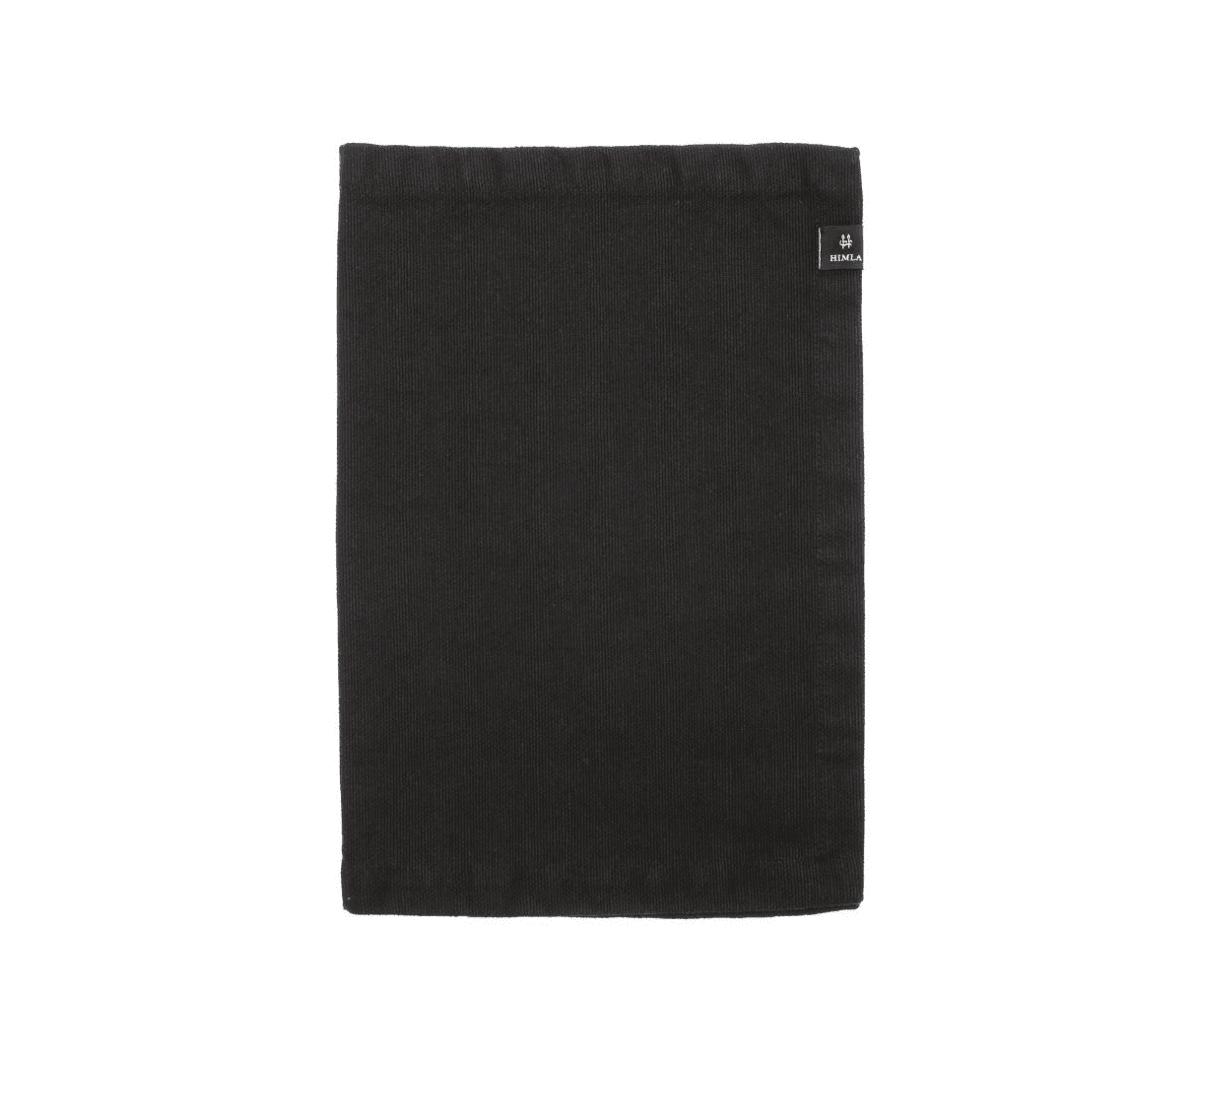 HIMLA Weekday Bordbrikke 37x50 cm, Black